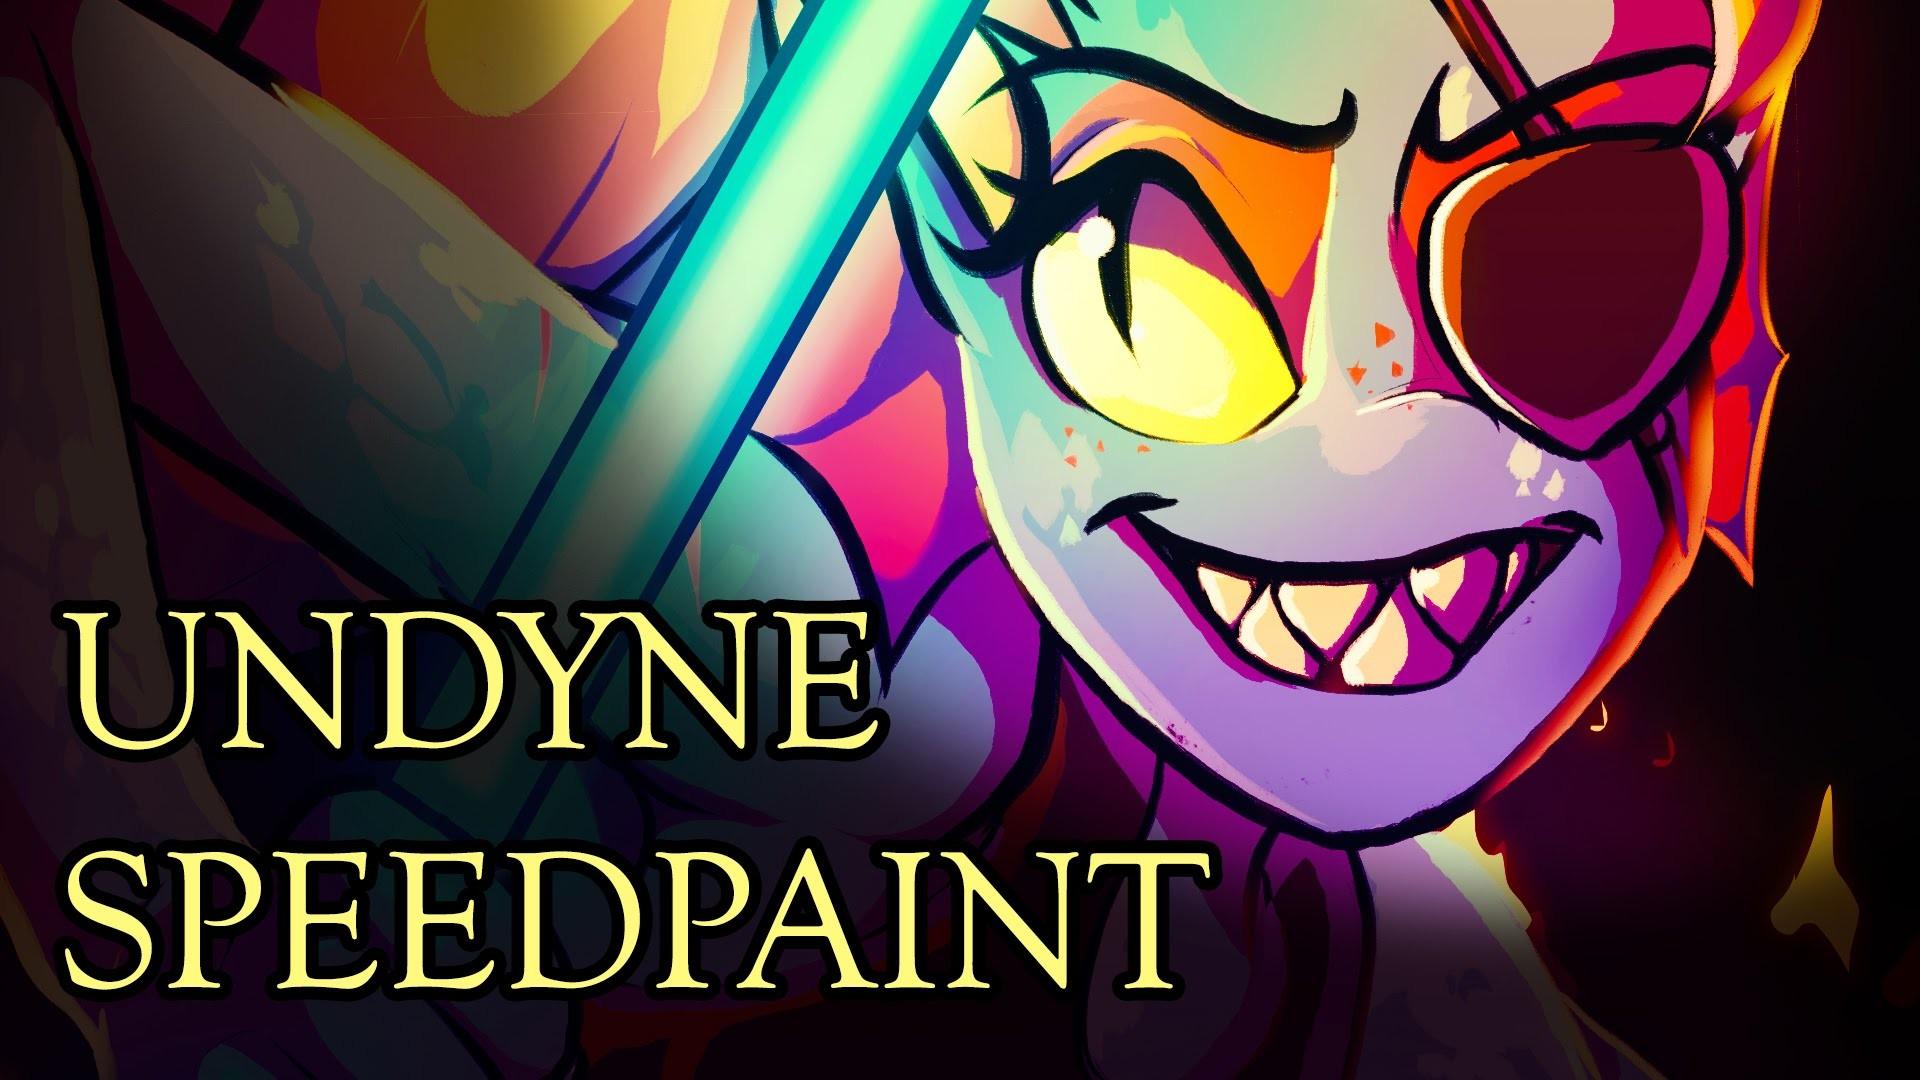 Undyne||Undertale Speedpaint